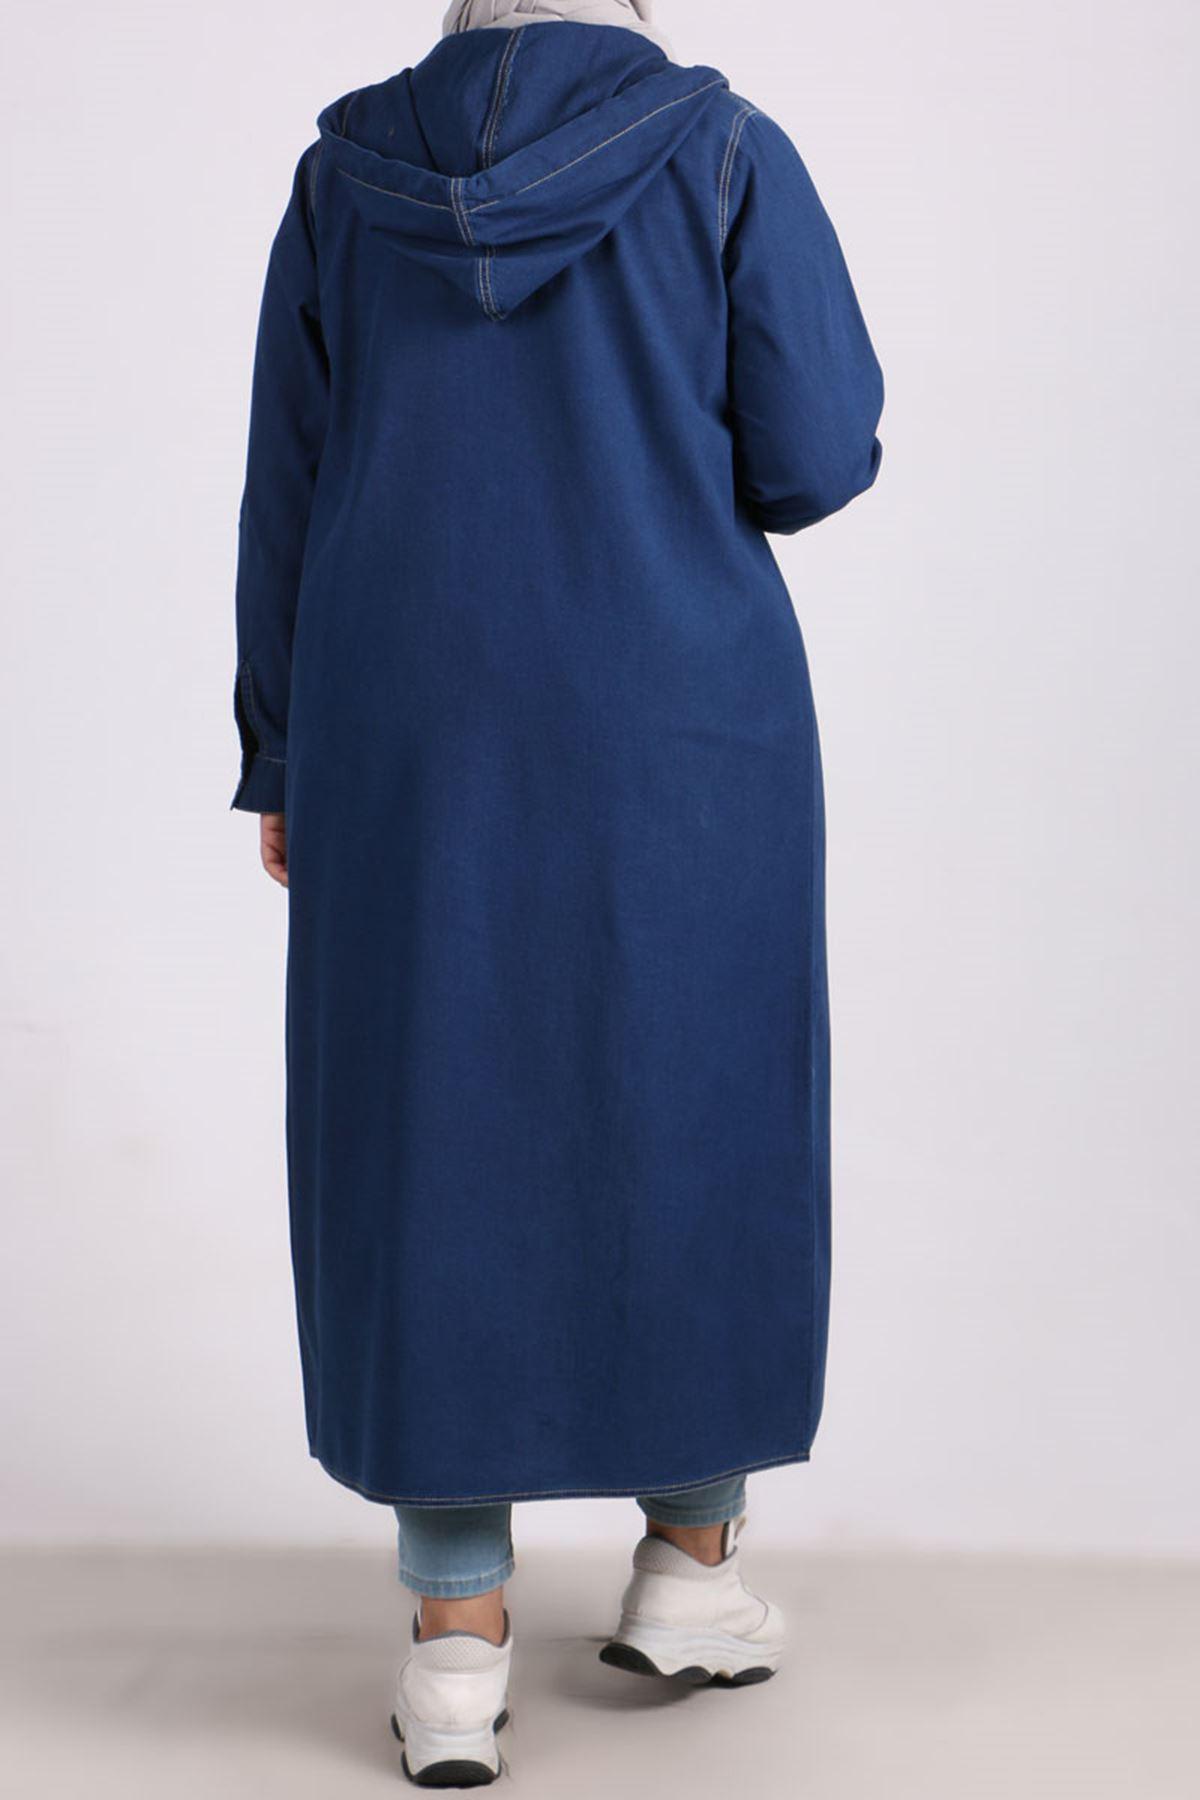 3148 Plus Size Snap Fastener Hooded Denim Jacket - Blue